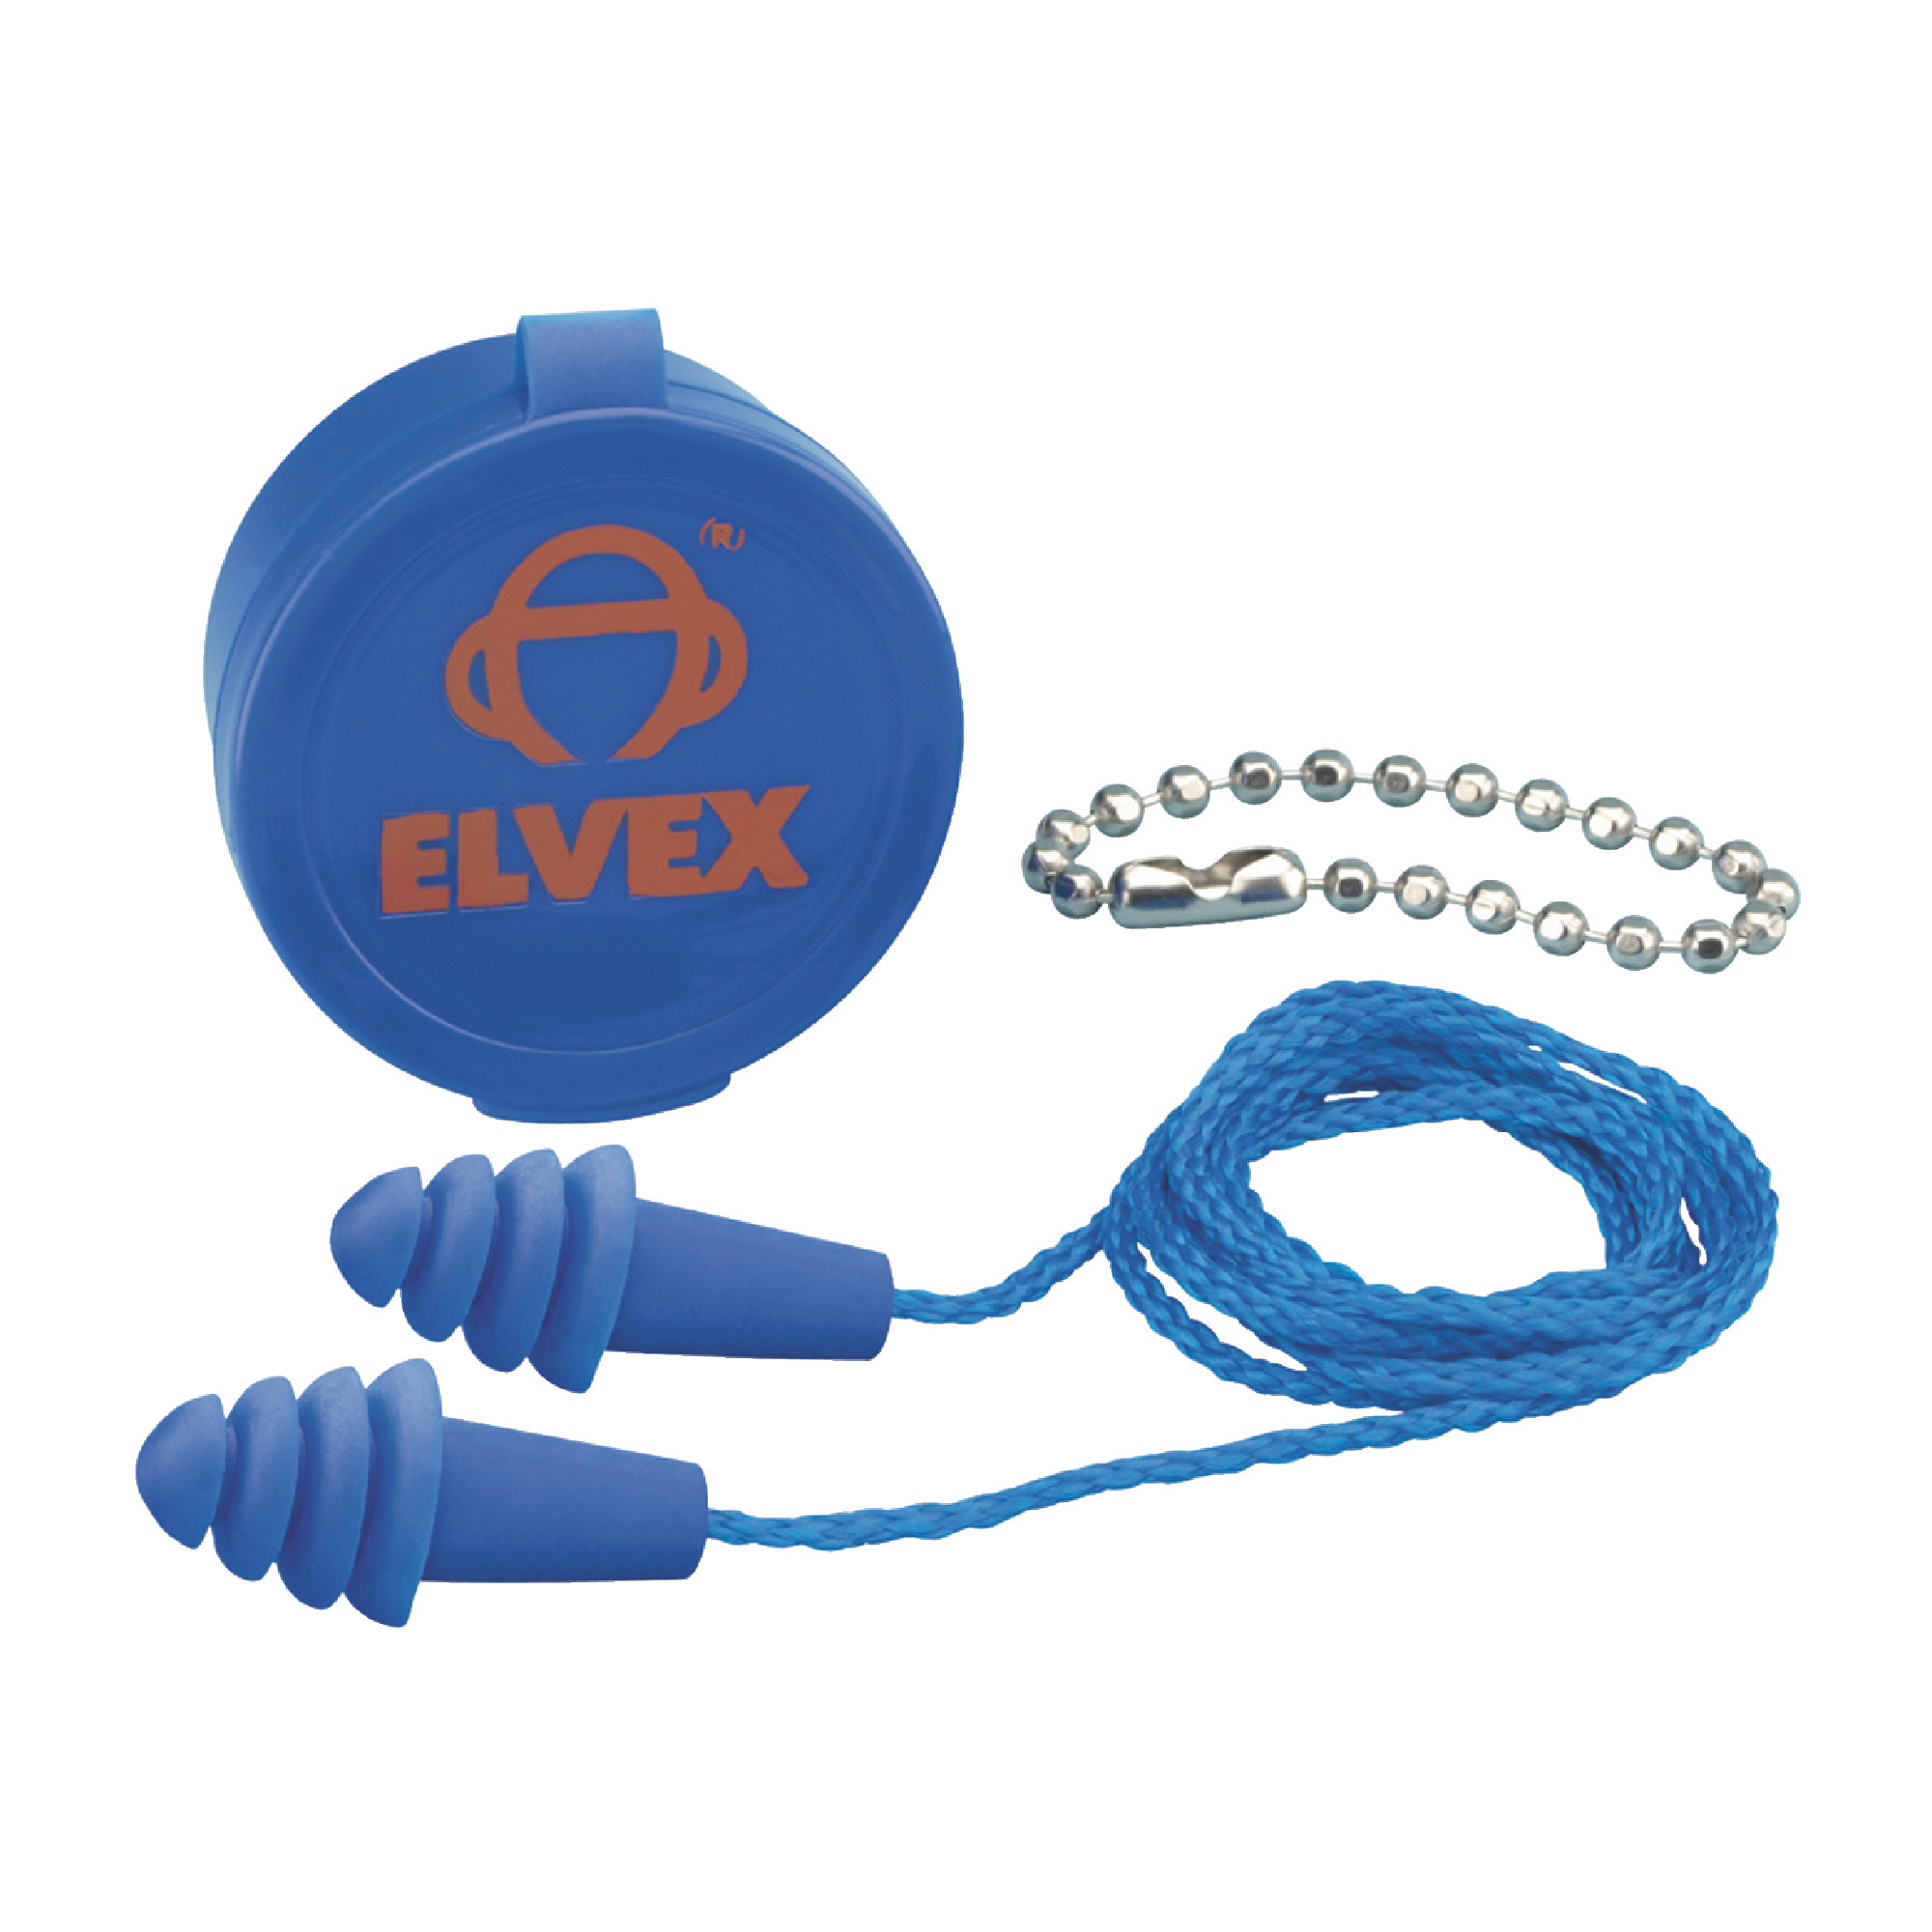 ELVEX Quattro Reusable Corded Blue Ear Plugs - 50/Pack